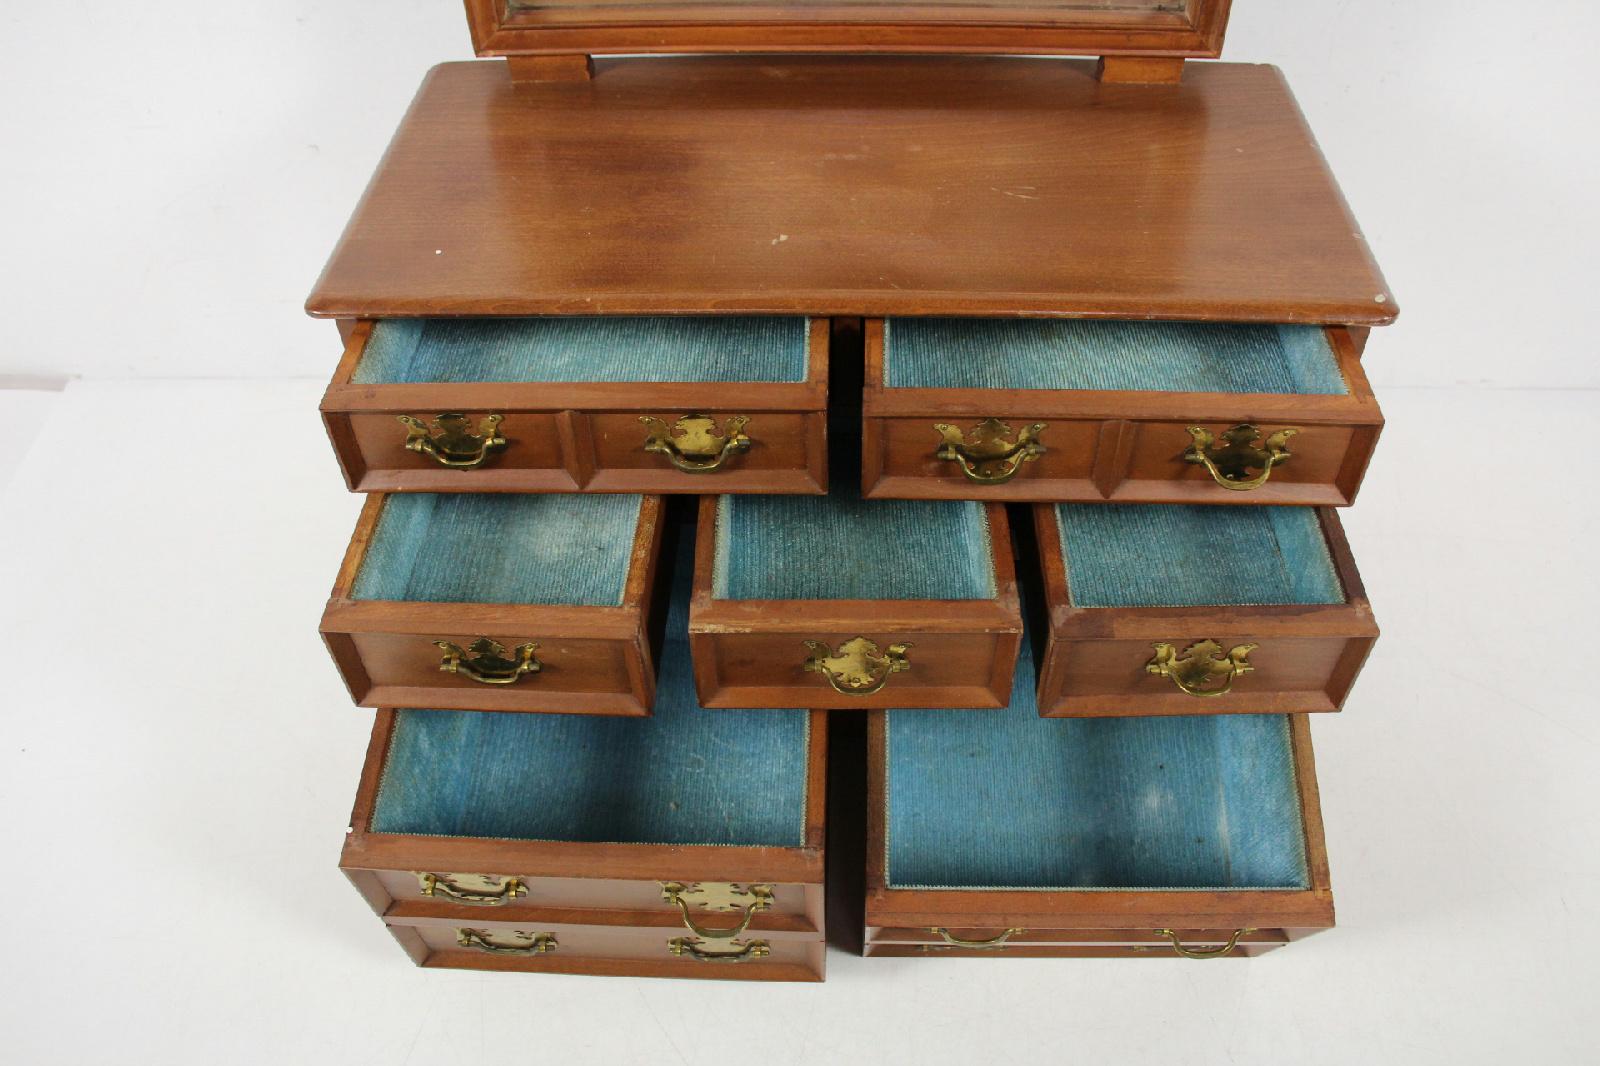 vintage mele japan wood table top chest drawers jewelry storage organizer box ebay. Black Bedroom Furniture Sets. Home Design Ideas